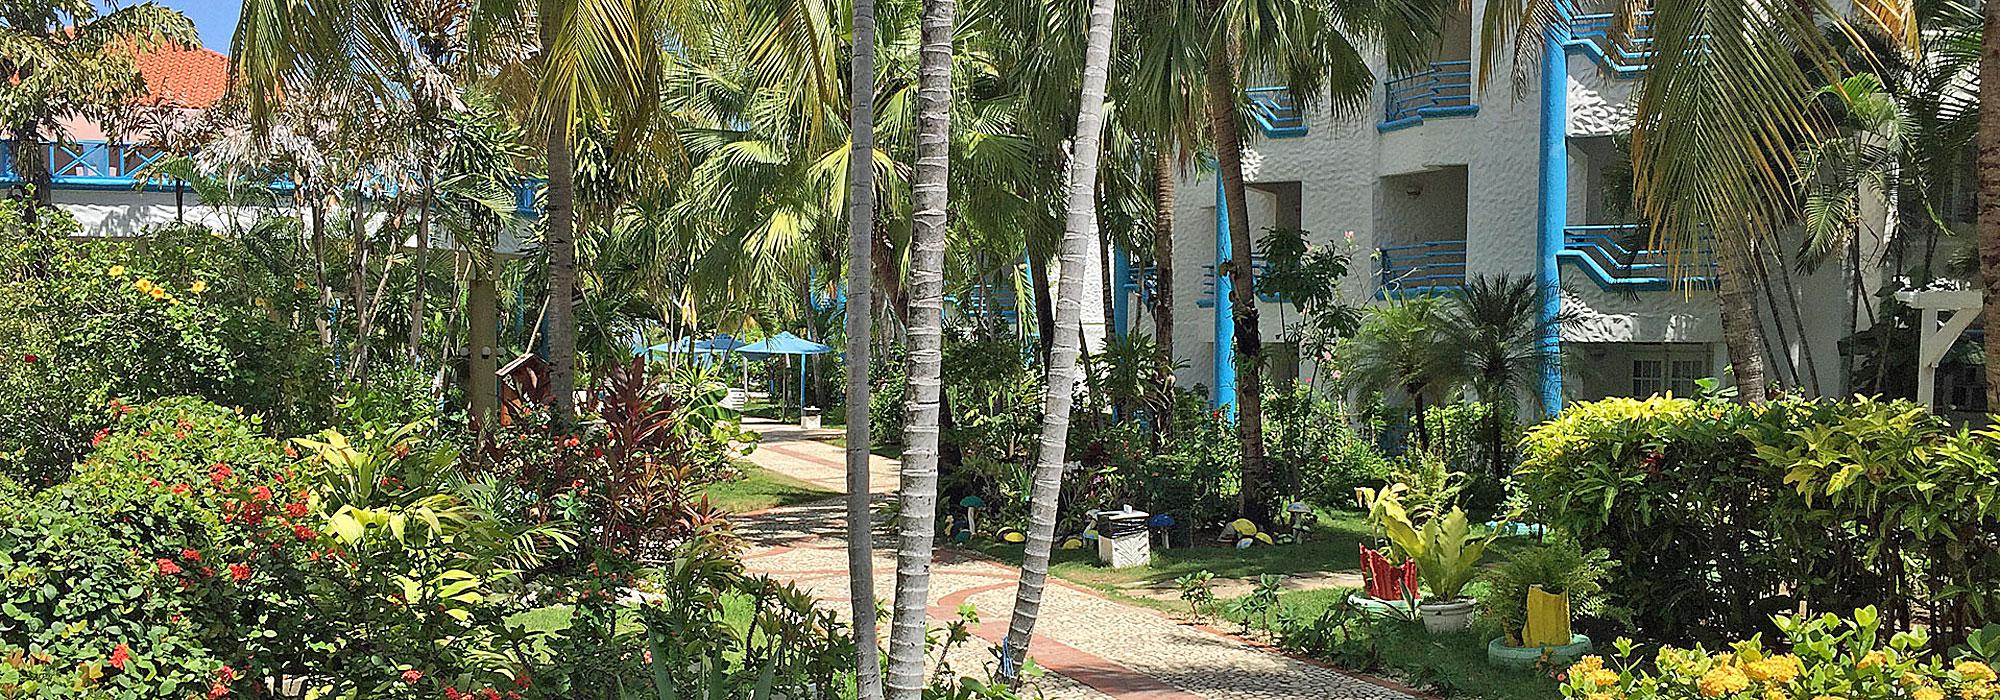 Costa-Larimar-Hotel_2000x700w